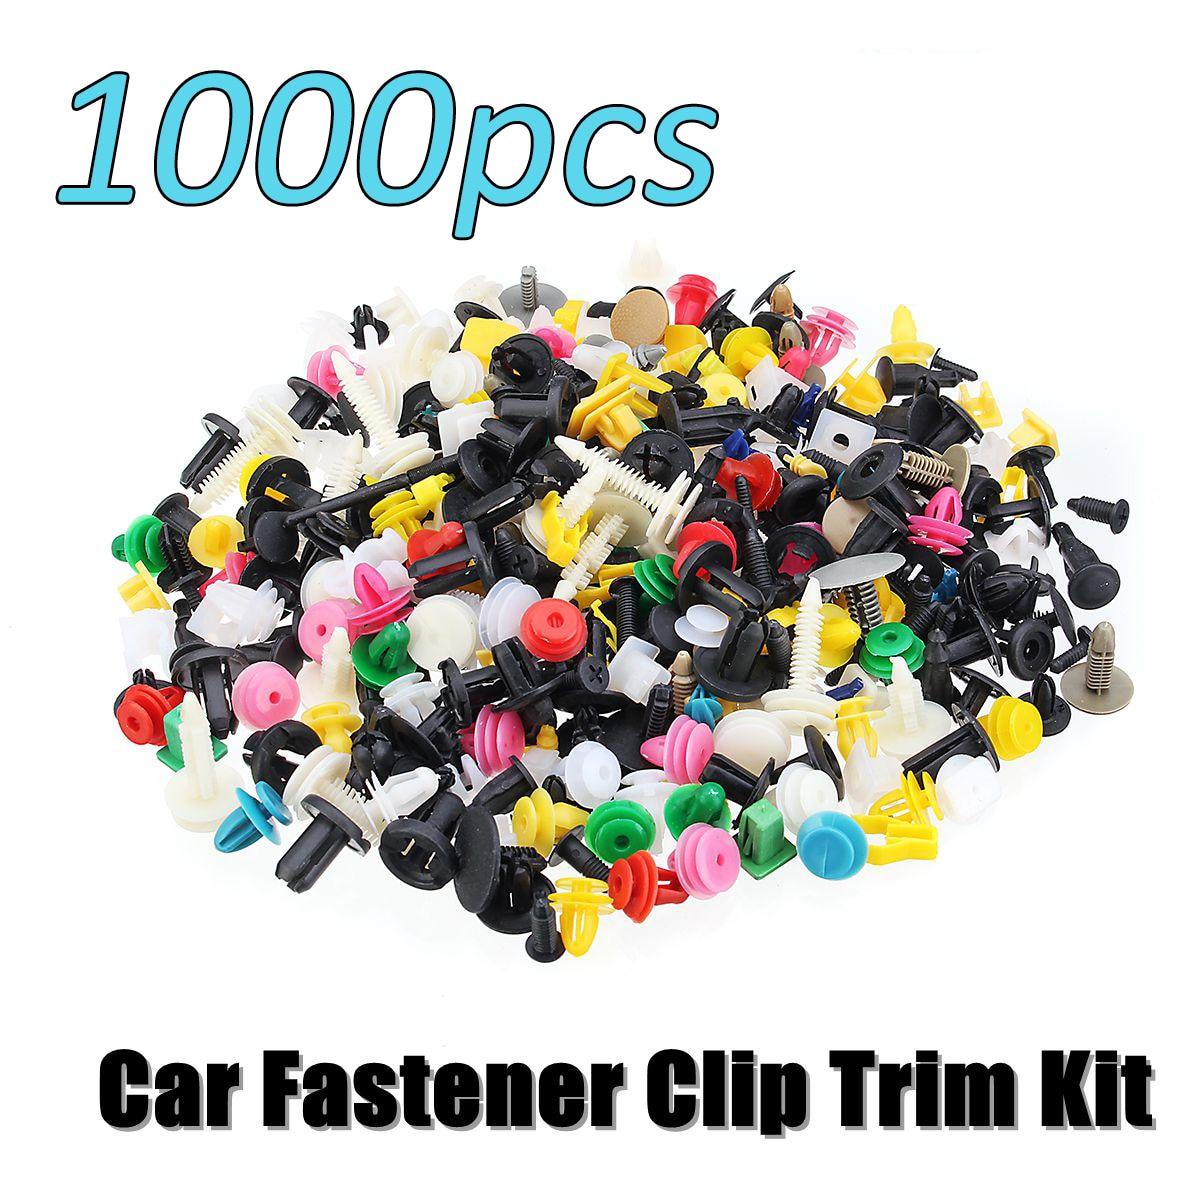 500Pcs Universal Mixed Auto Fastener Car Bumper Clips Retainer Push Engine Cover Car Fastener Rivet Door Panel For Fender Liner